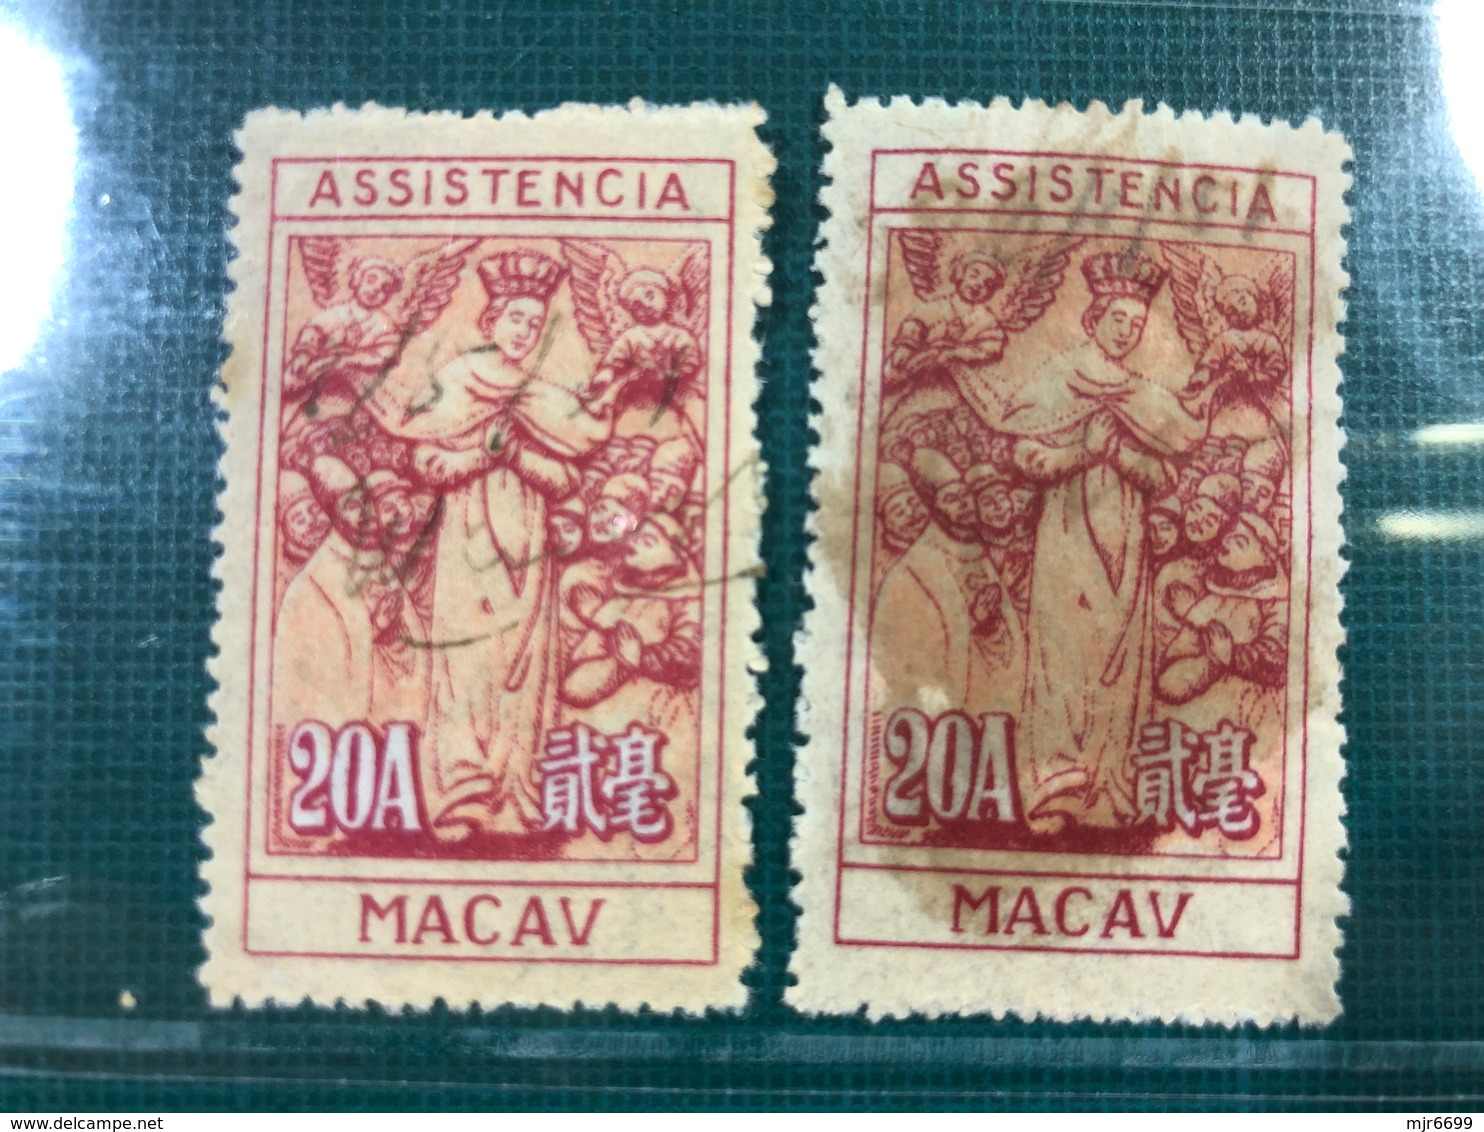 MACAU, 1947 MERCY TAX STAMPS 20 AVOS X 2, USED - Macao